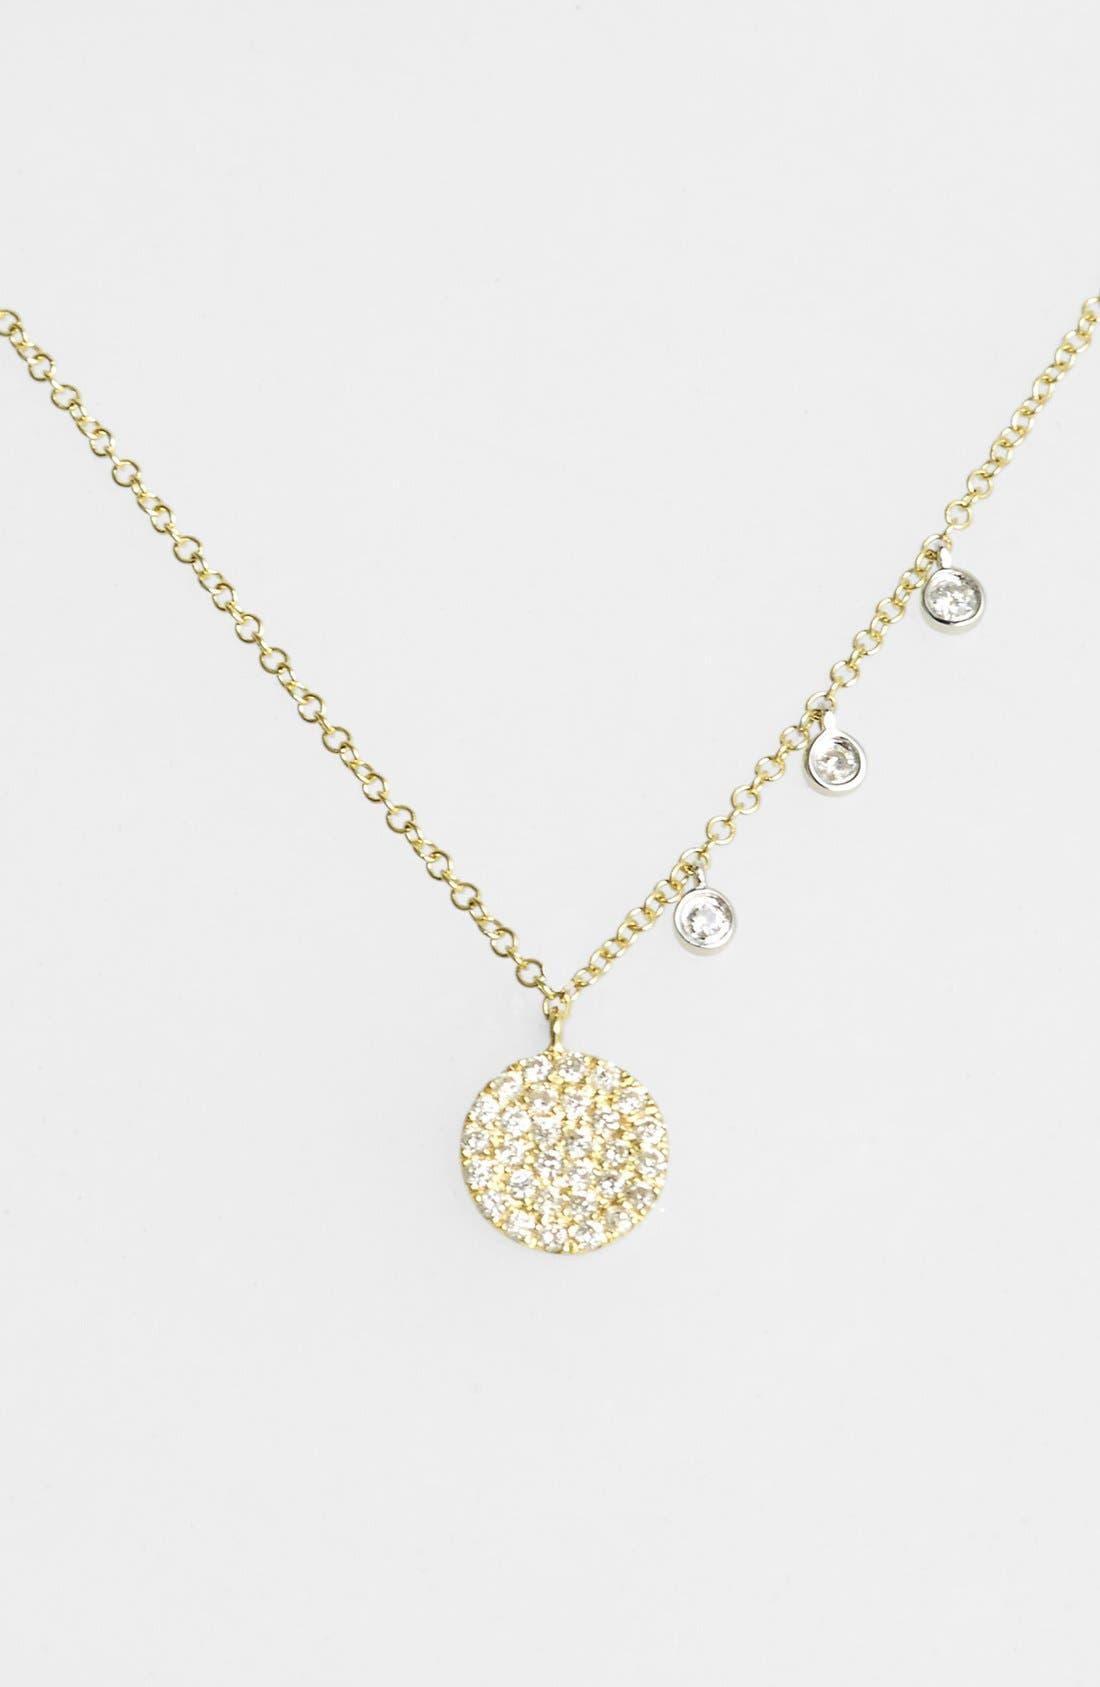 Women's Meira T Dazzling Diamond Disc Pendant Necklace -  1N7176-Y